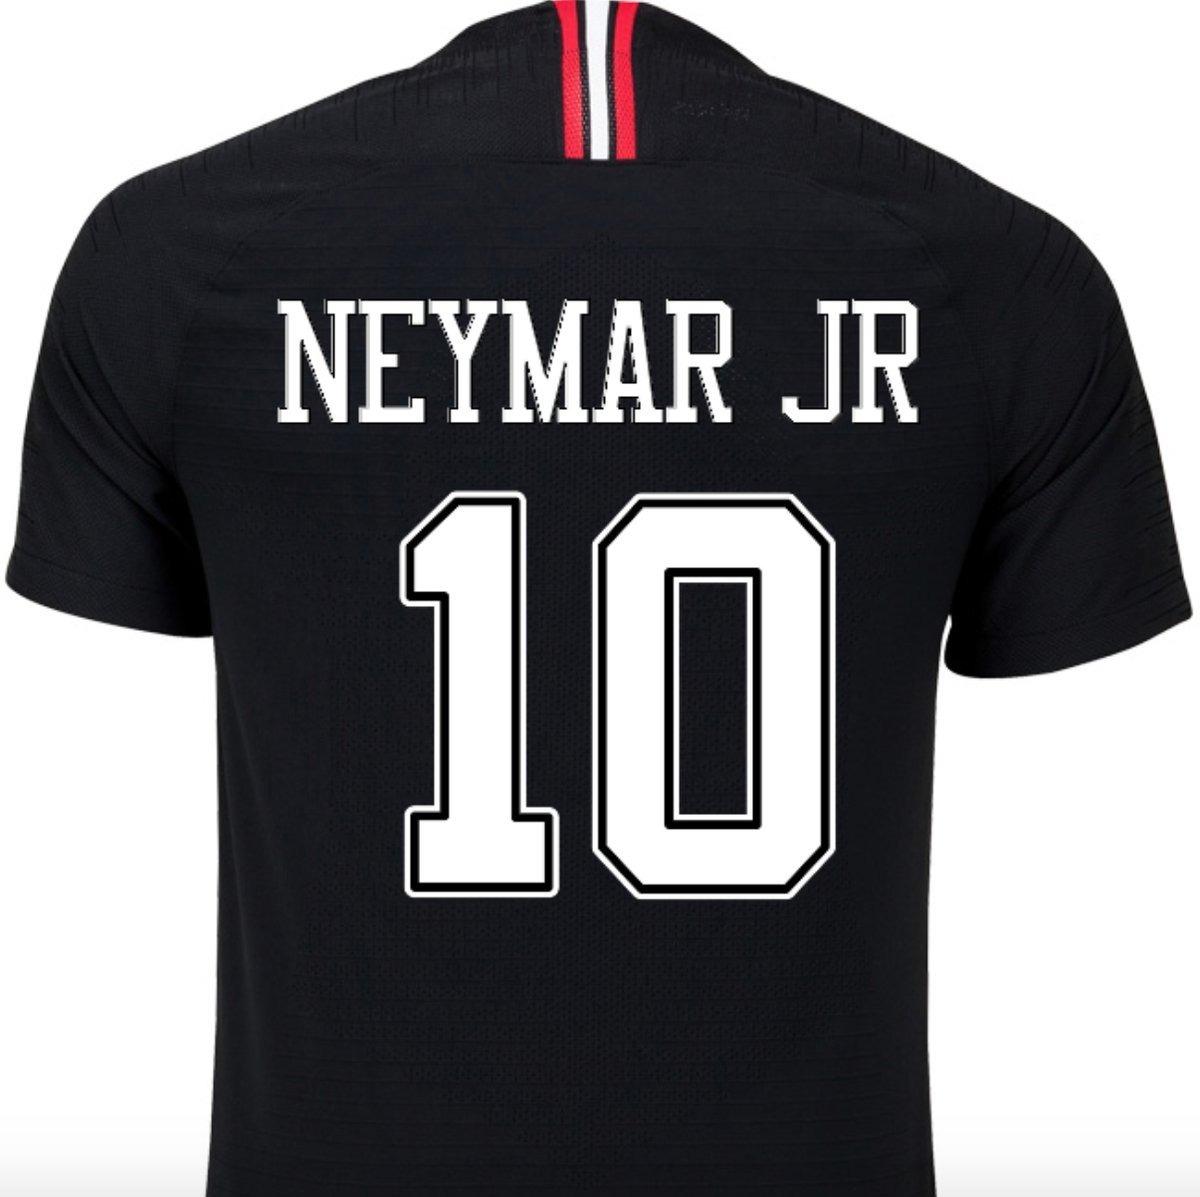 24f94691b camisa psg air jordan neymar jr modelo 18 19 ( personalizada. Carregando  zoom.